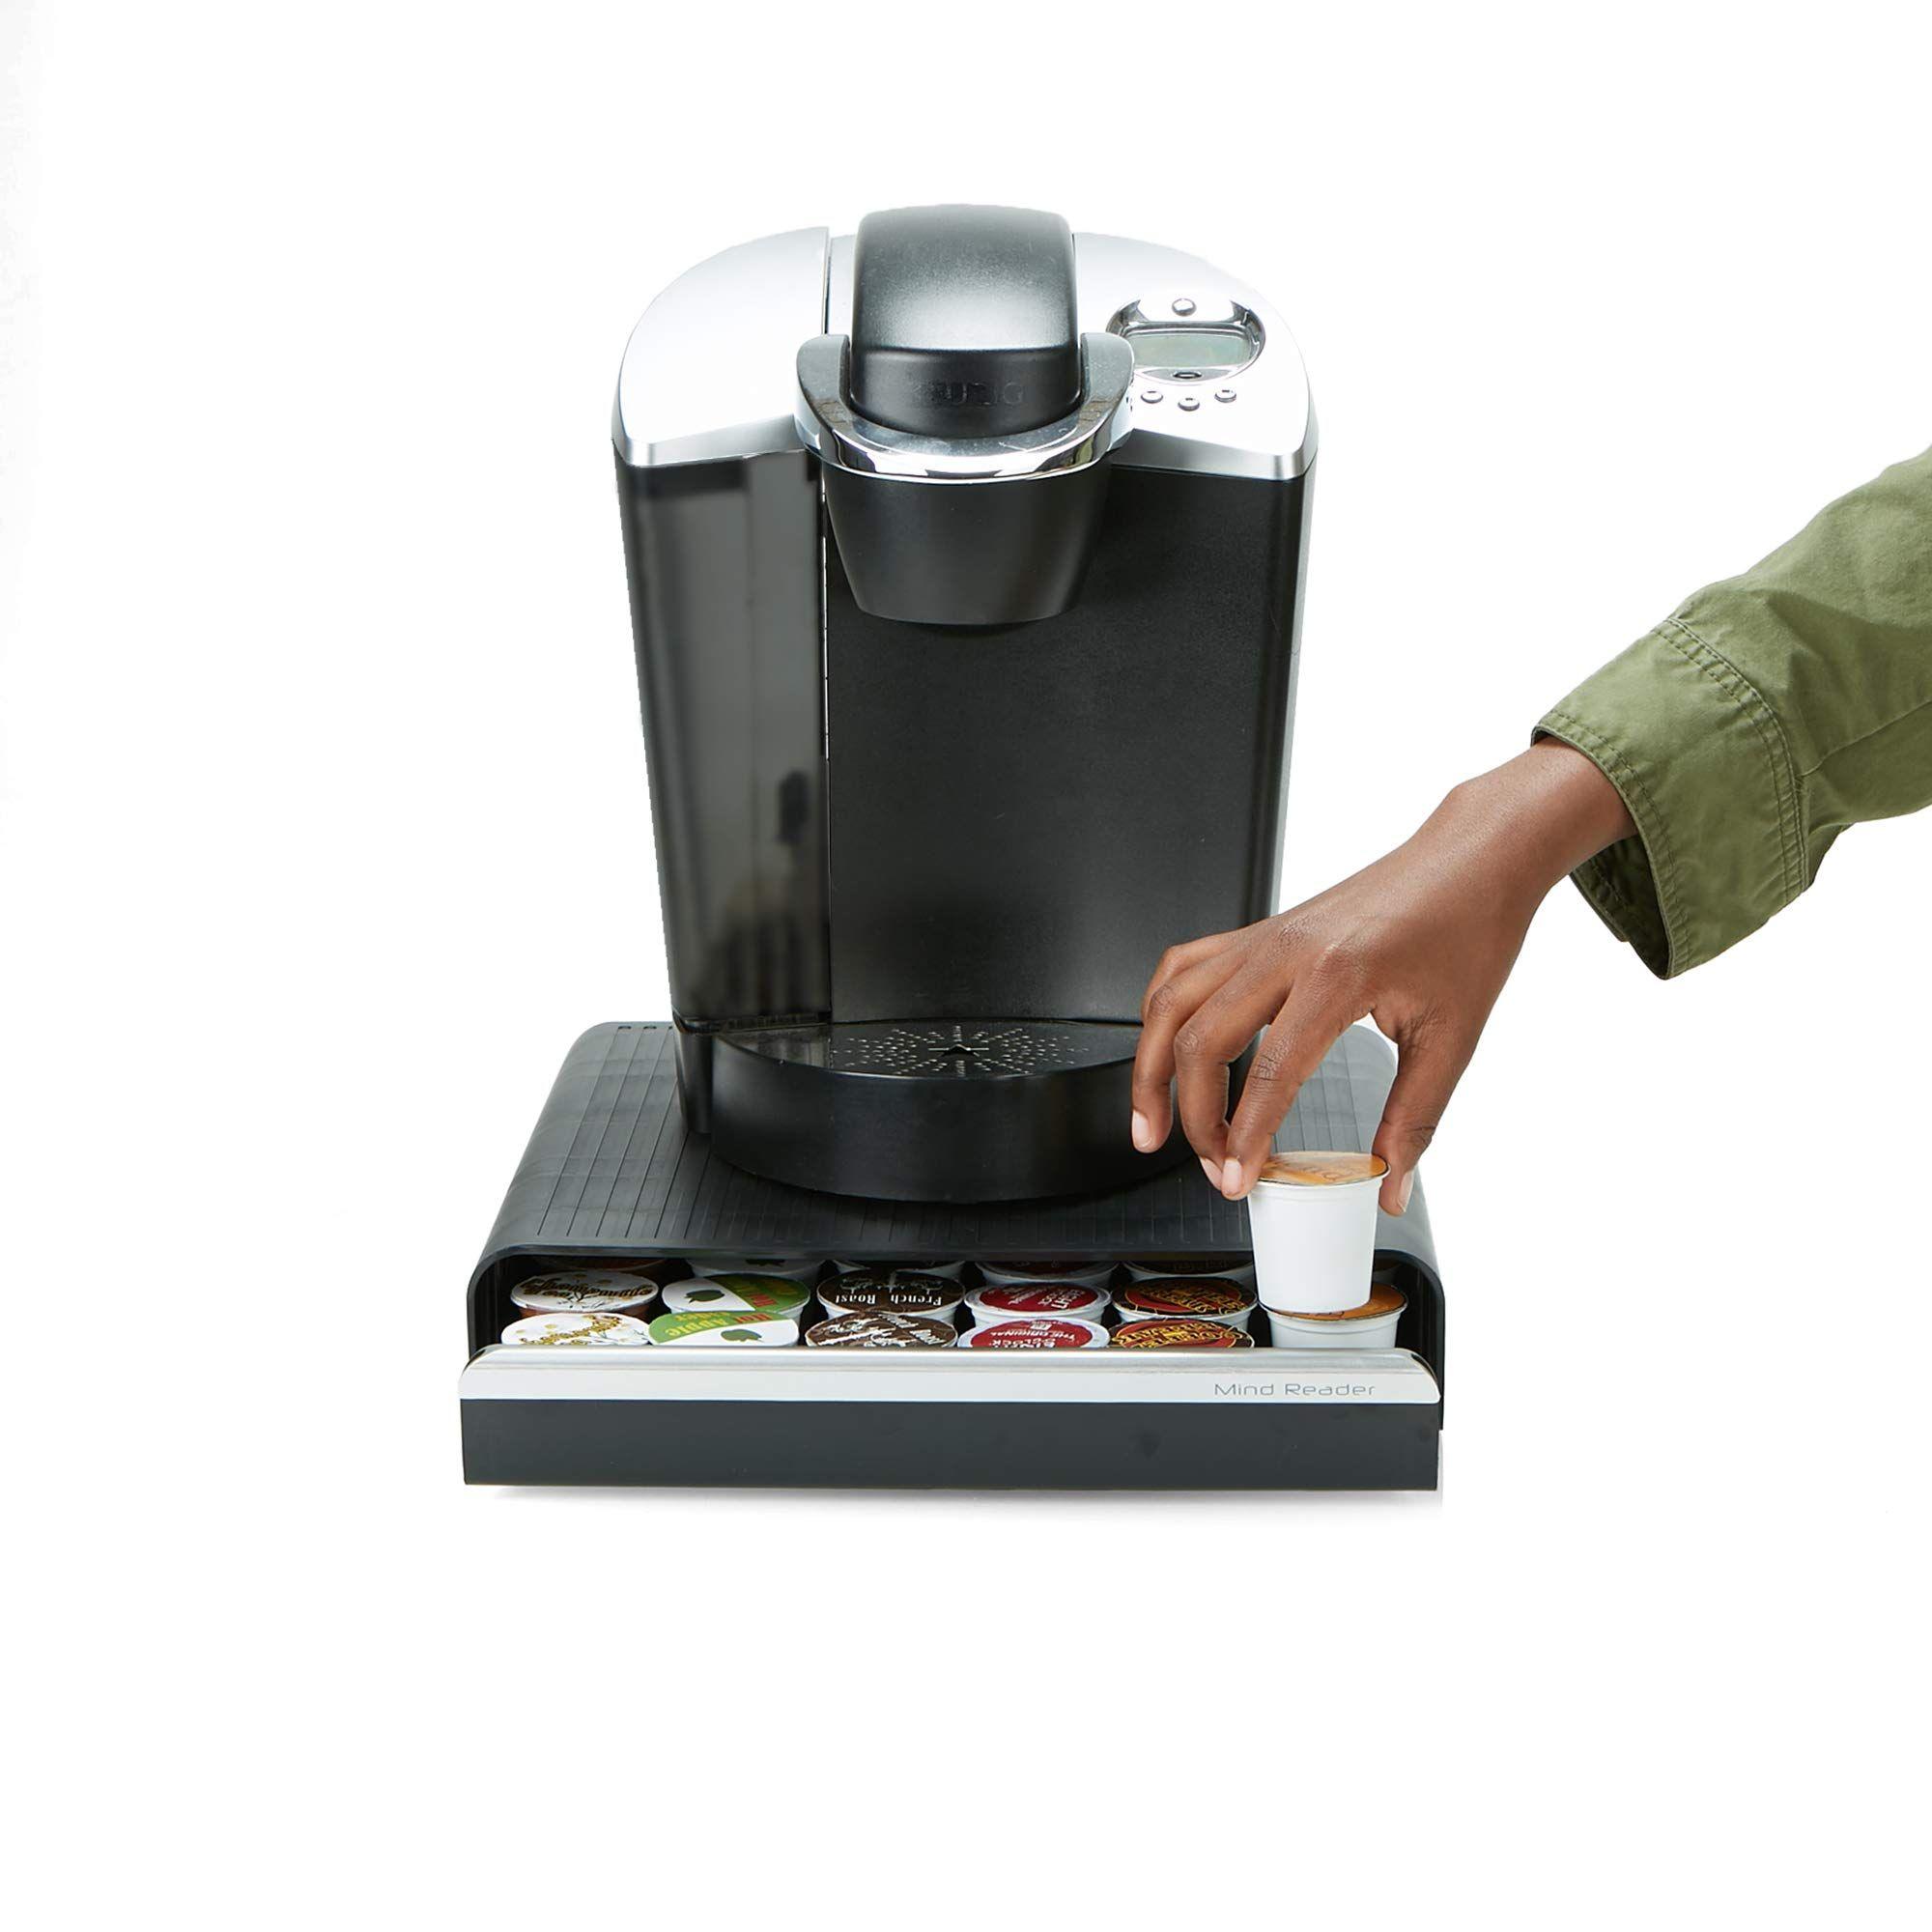 Mindreaderhero36blkstorageverismo coffee pods